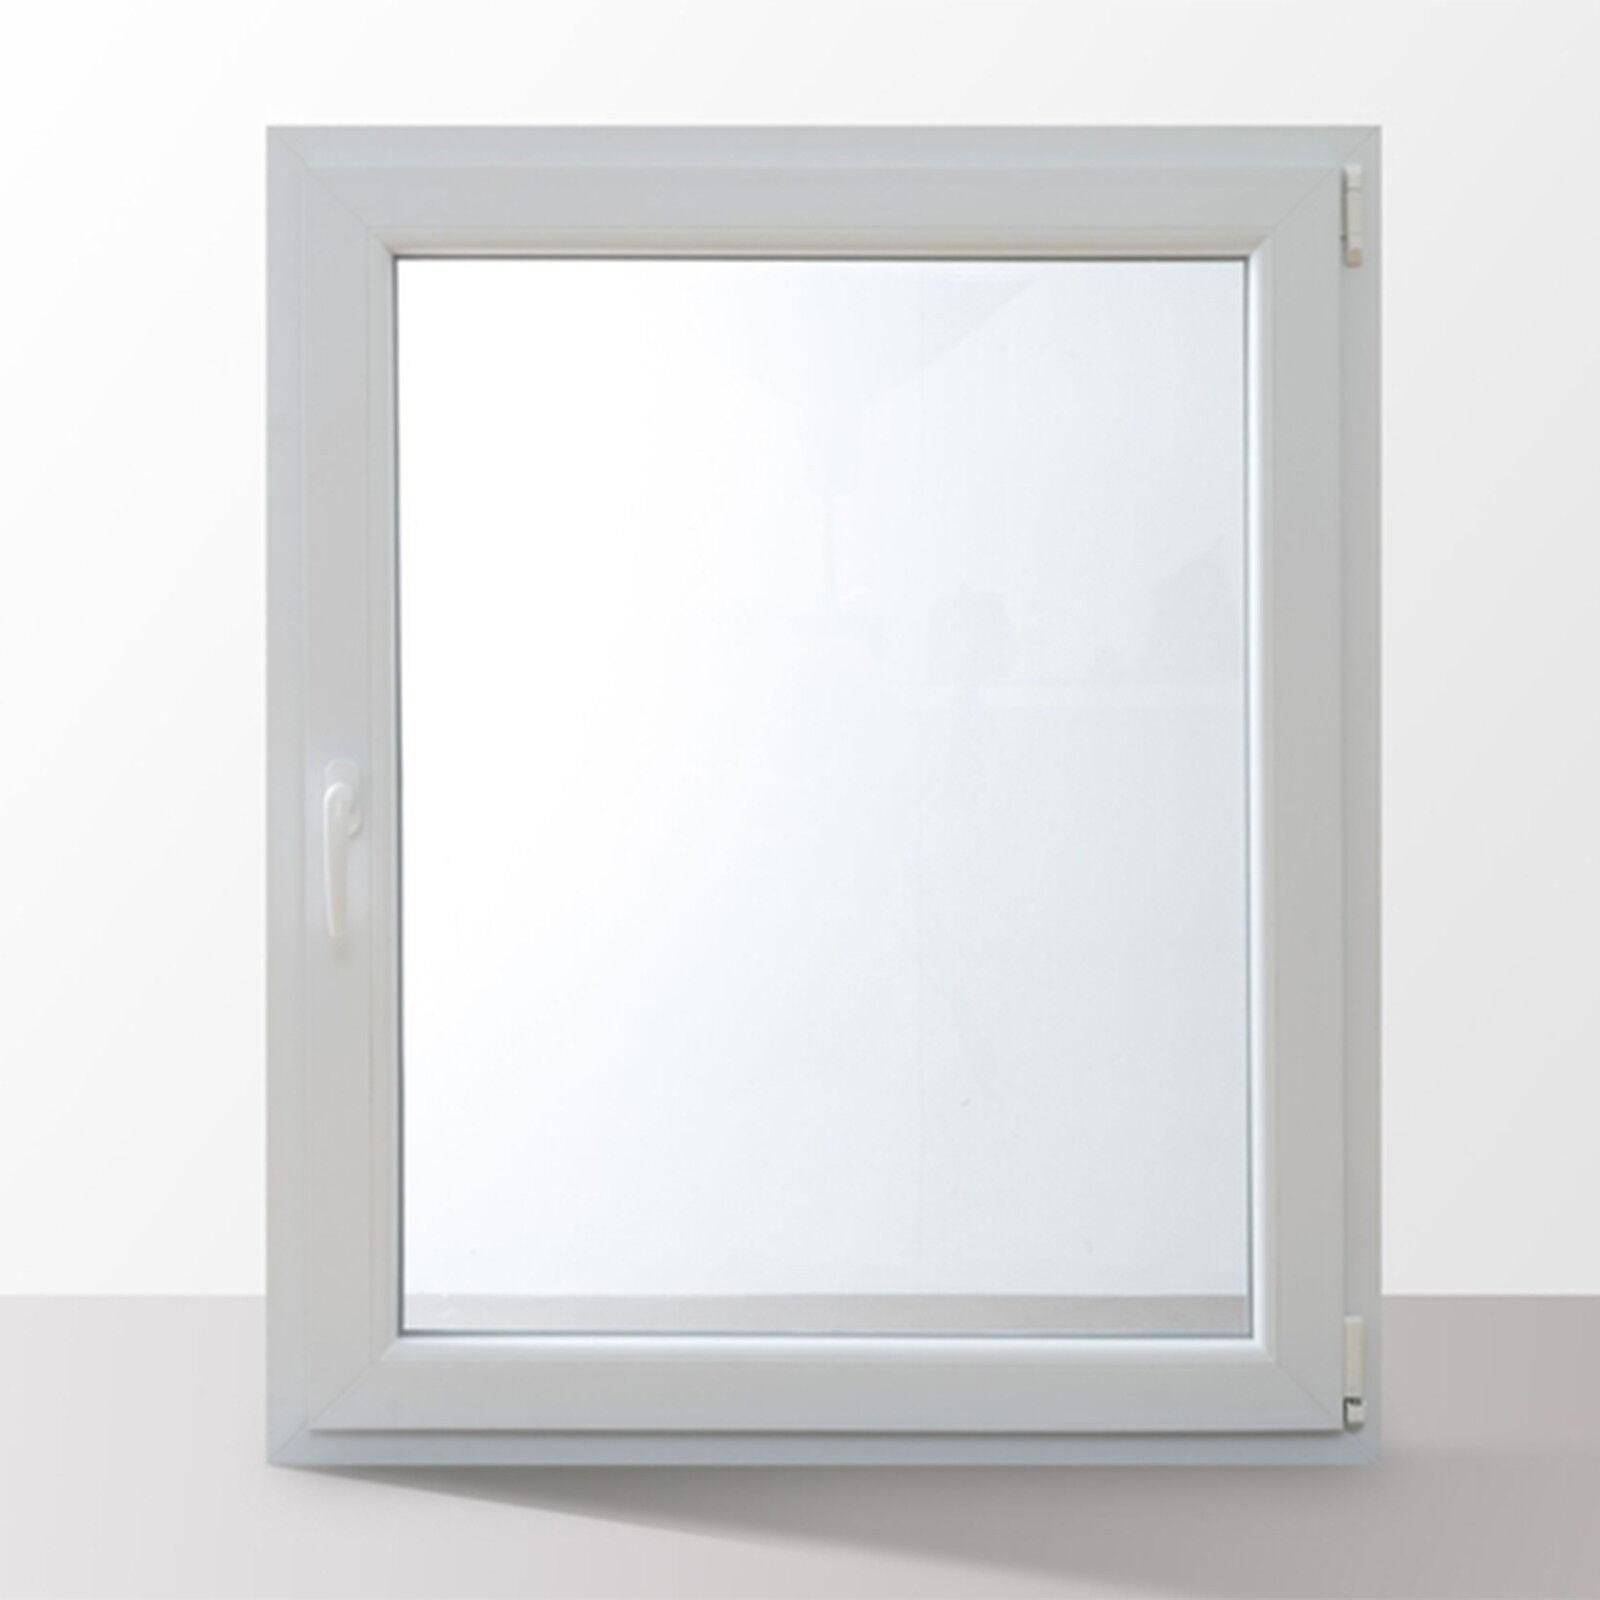 Fenster Kunststofffenster Kellerfenster Dreh Kipp Fenster 2-fach Verglasung weiß